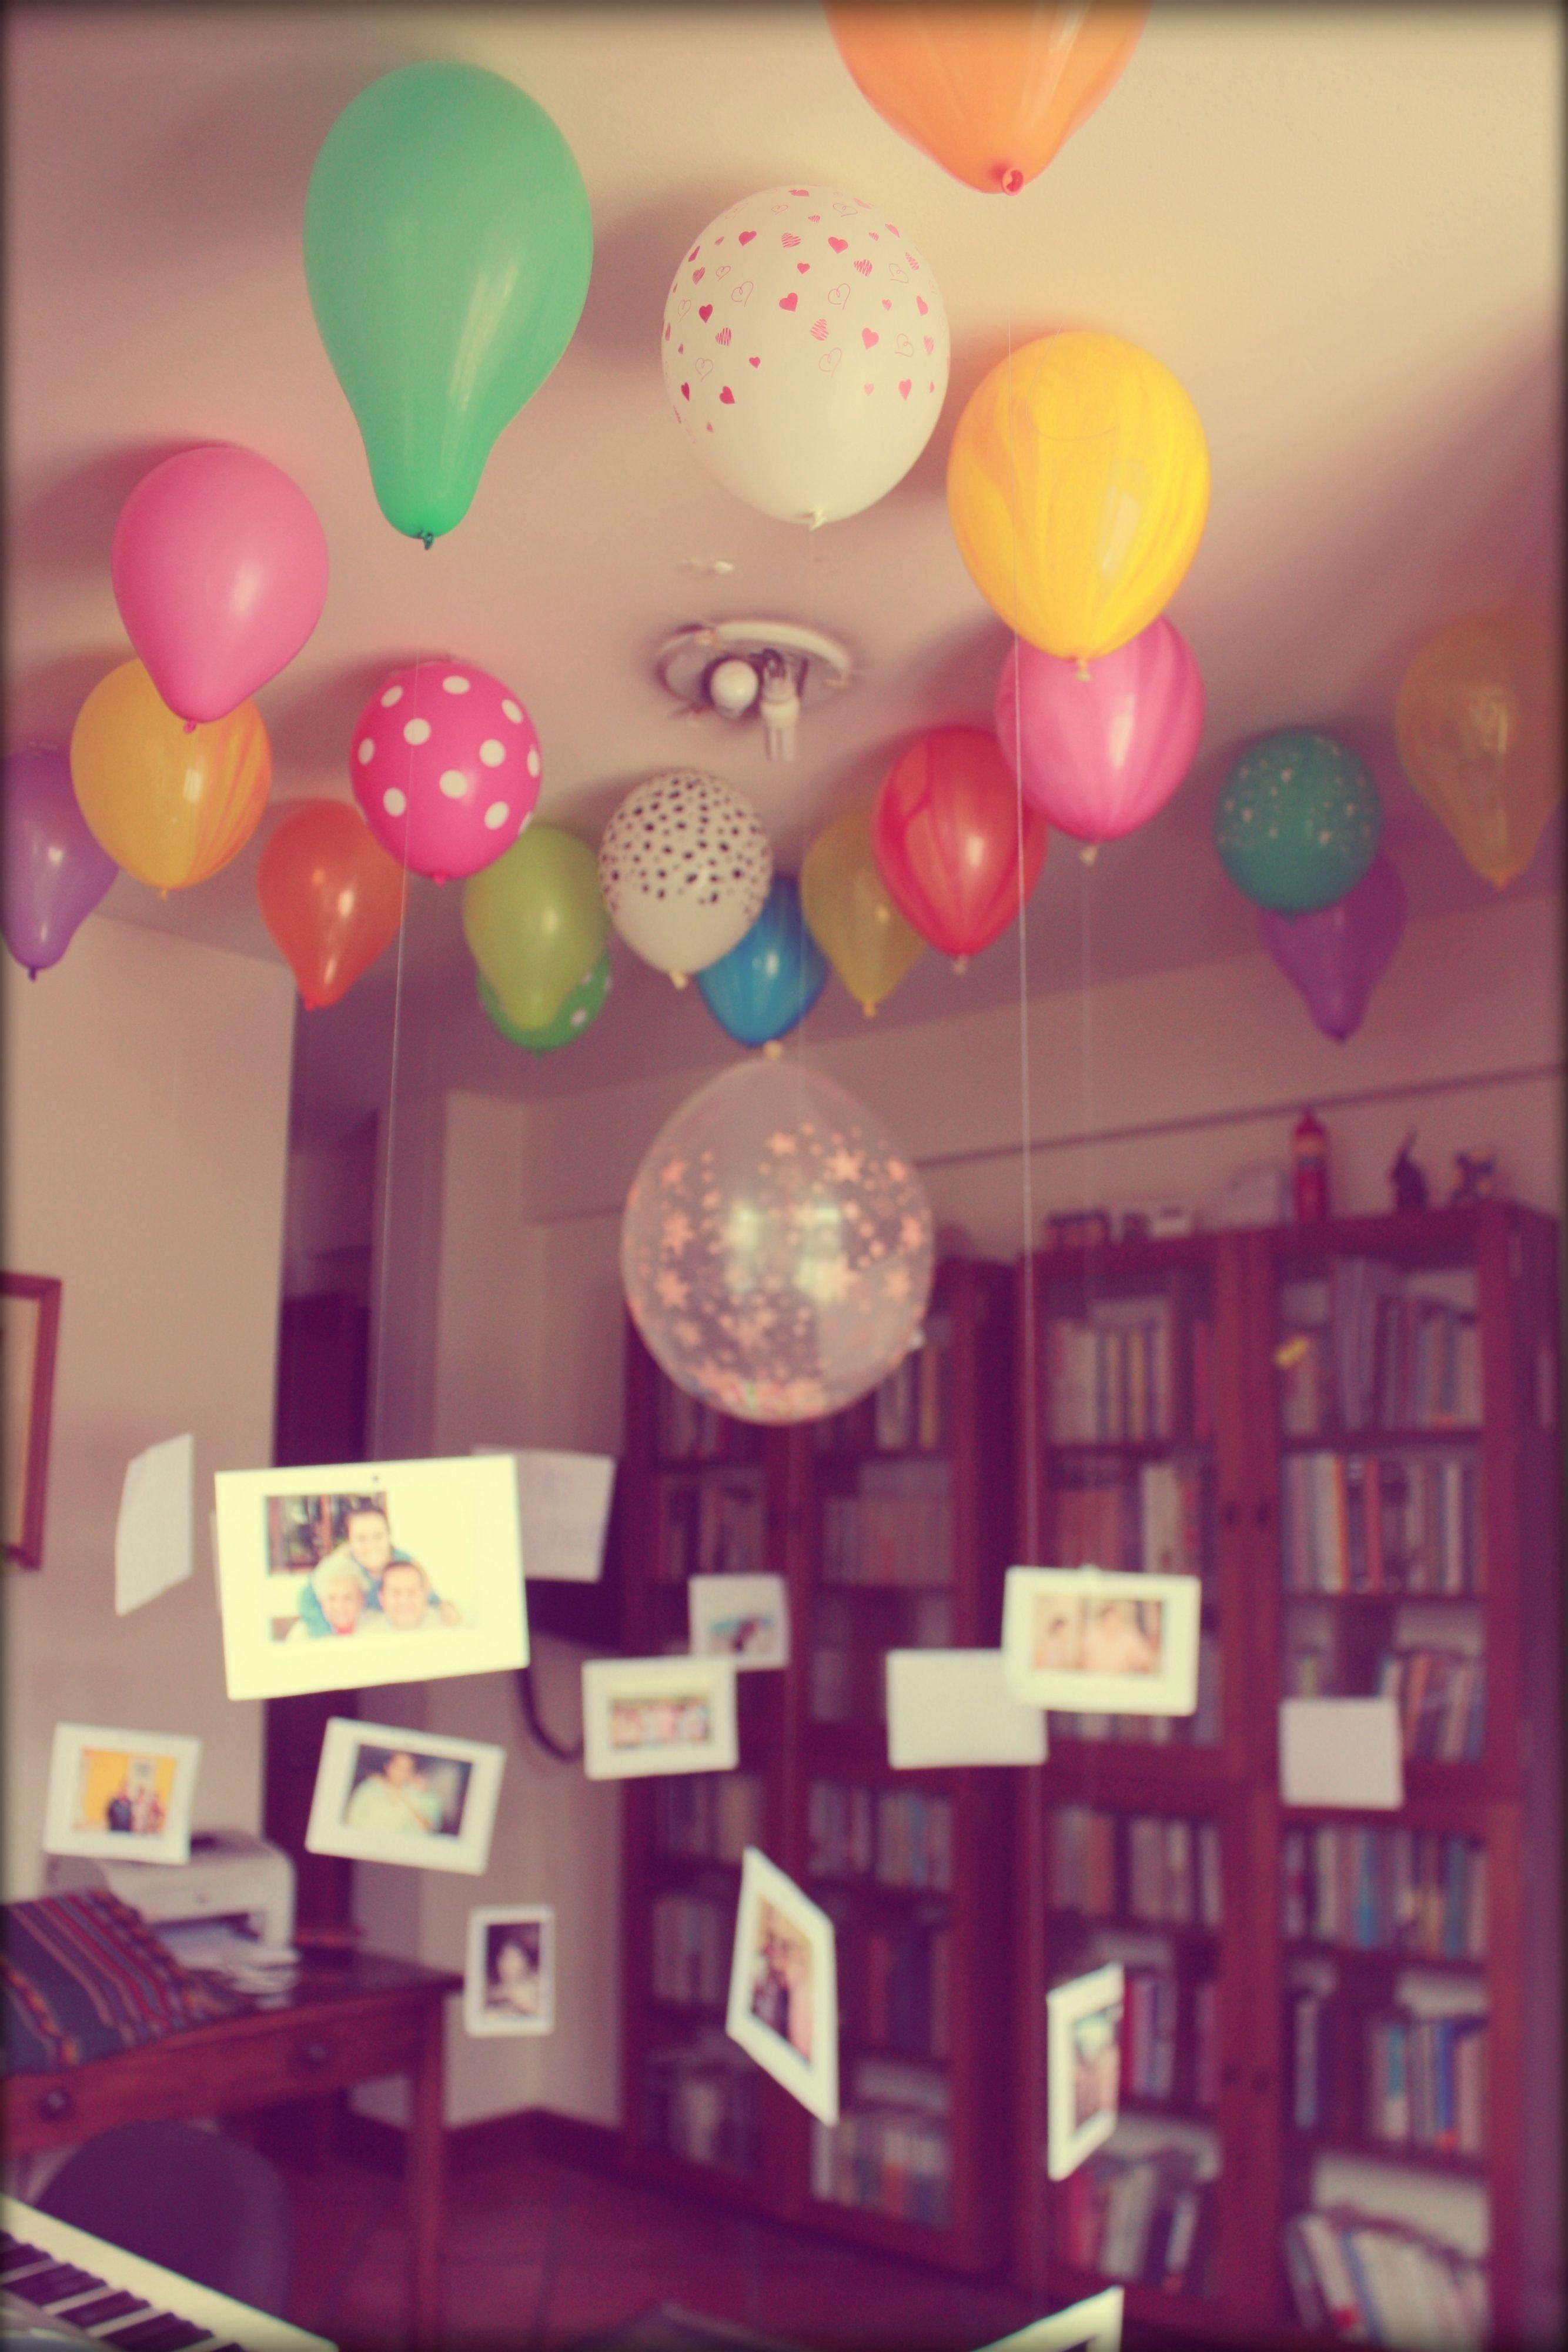 10 Awesome Fun Birthday Ideas For Girlfriend diy sorpresa sorpresa anniversary surprise diy birthday and 2020